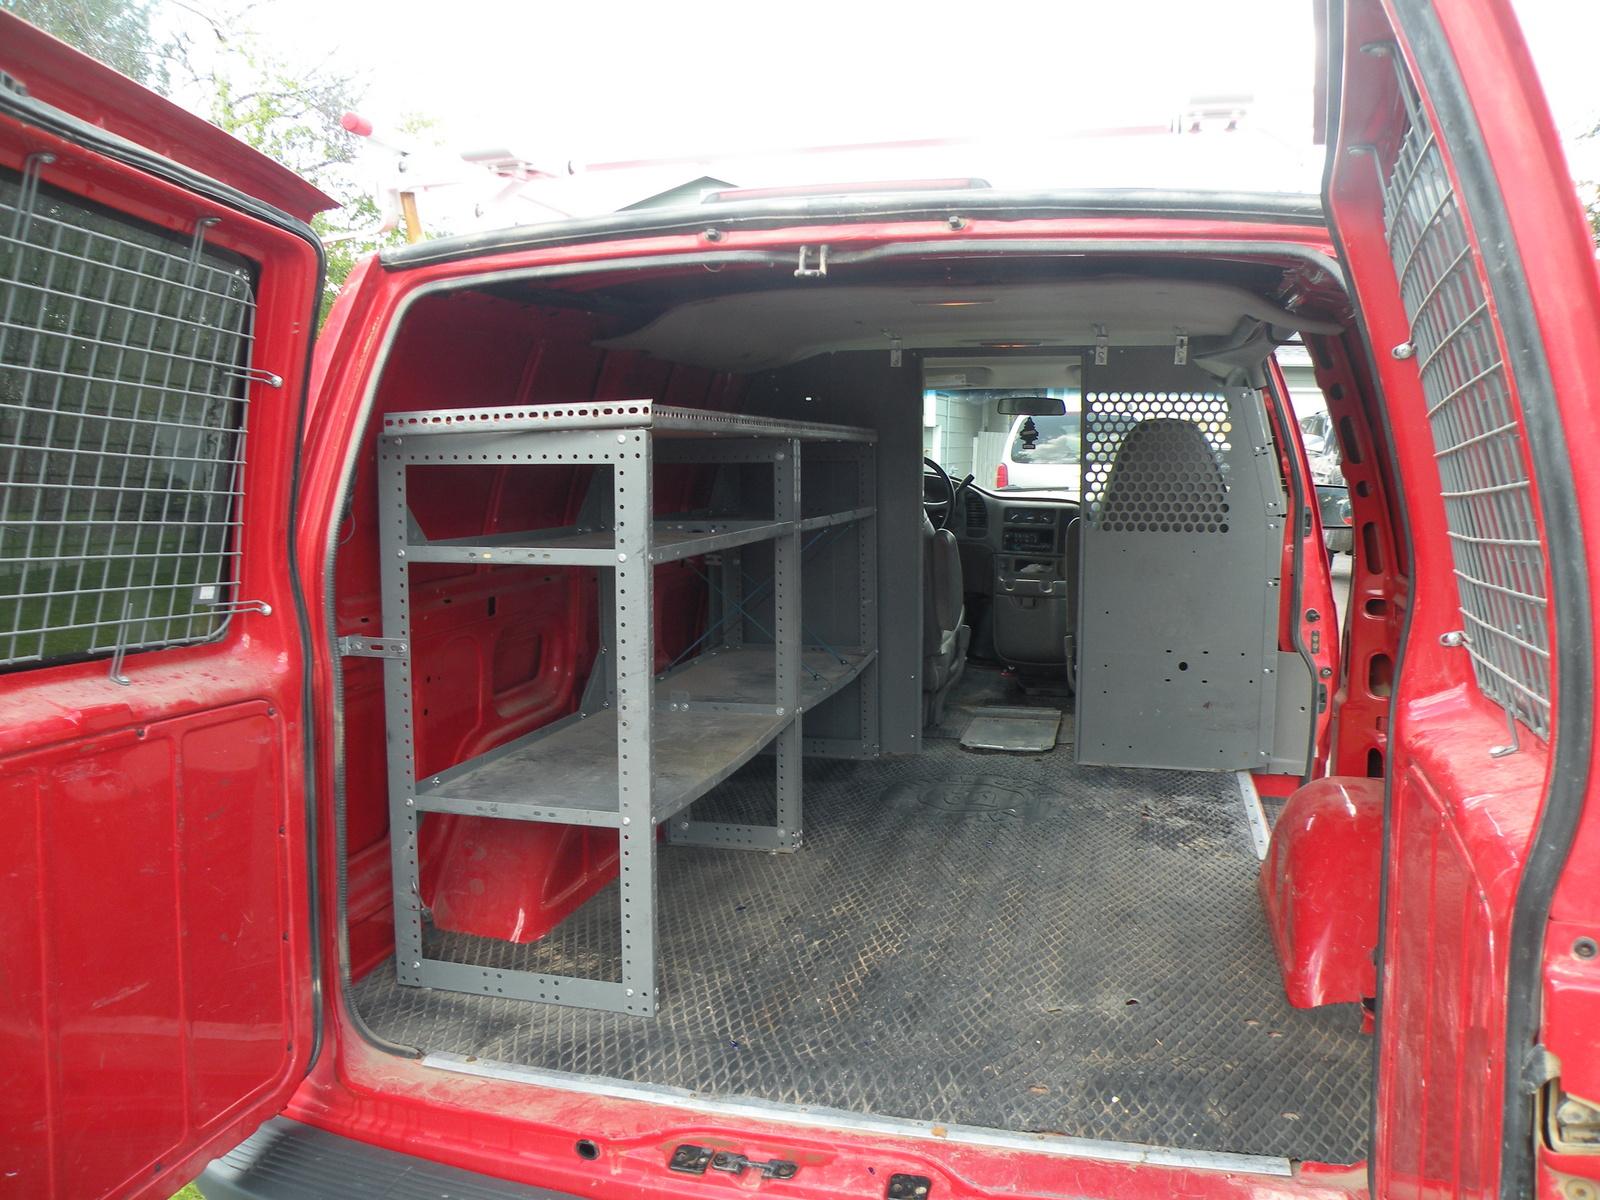 2003 Chevrolet Astro Cargo Image 10